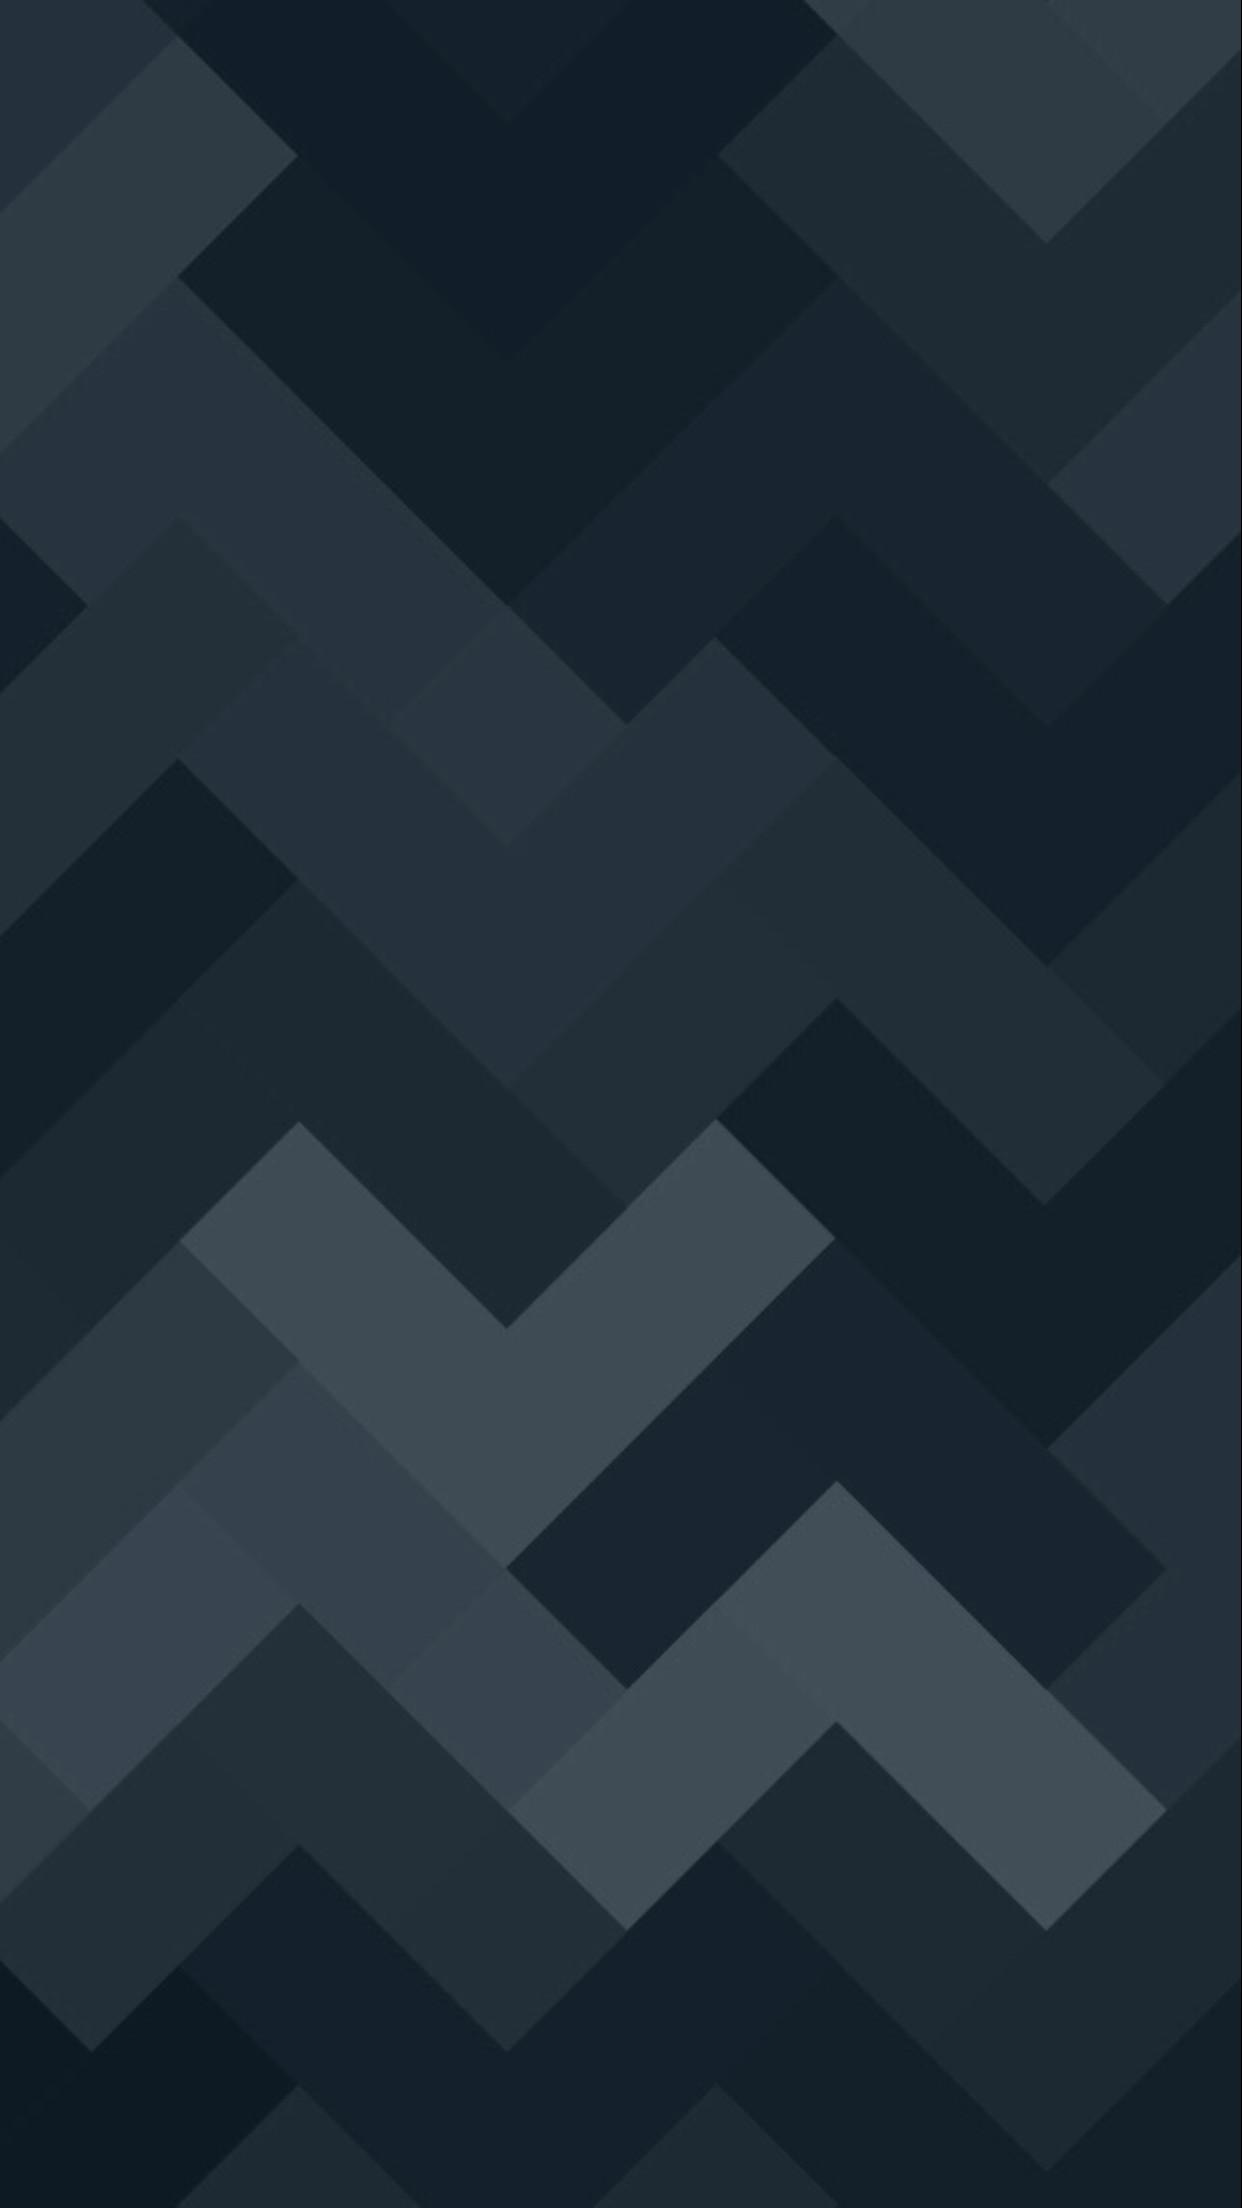 Shapes Black Wallpaper iPhone 6 Plus